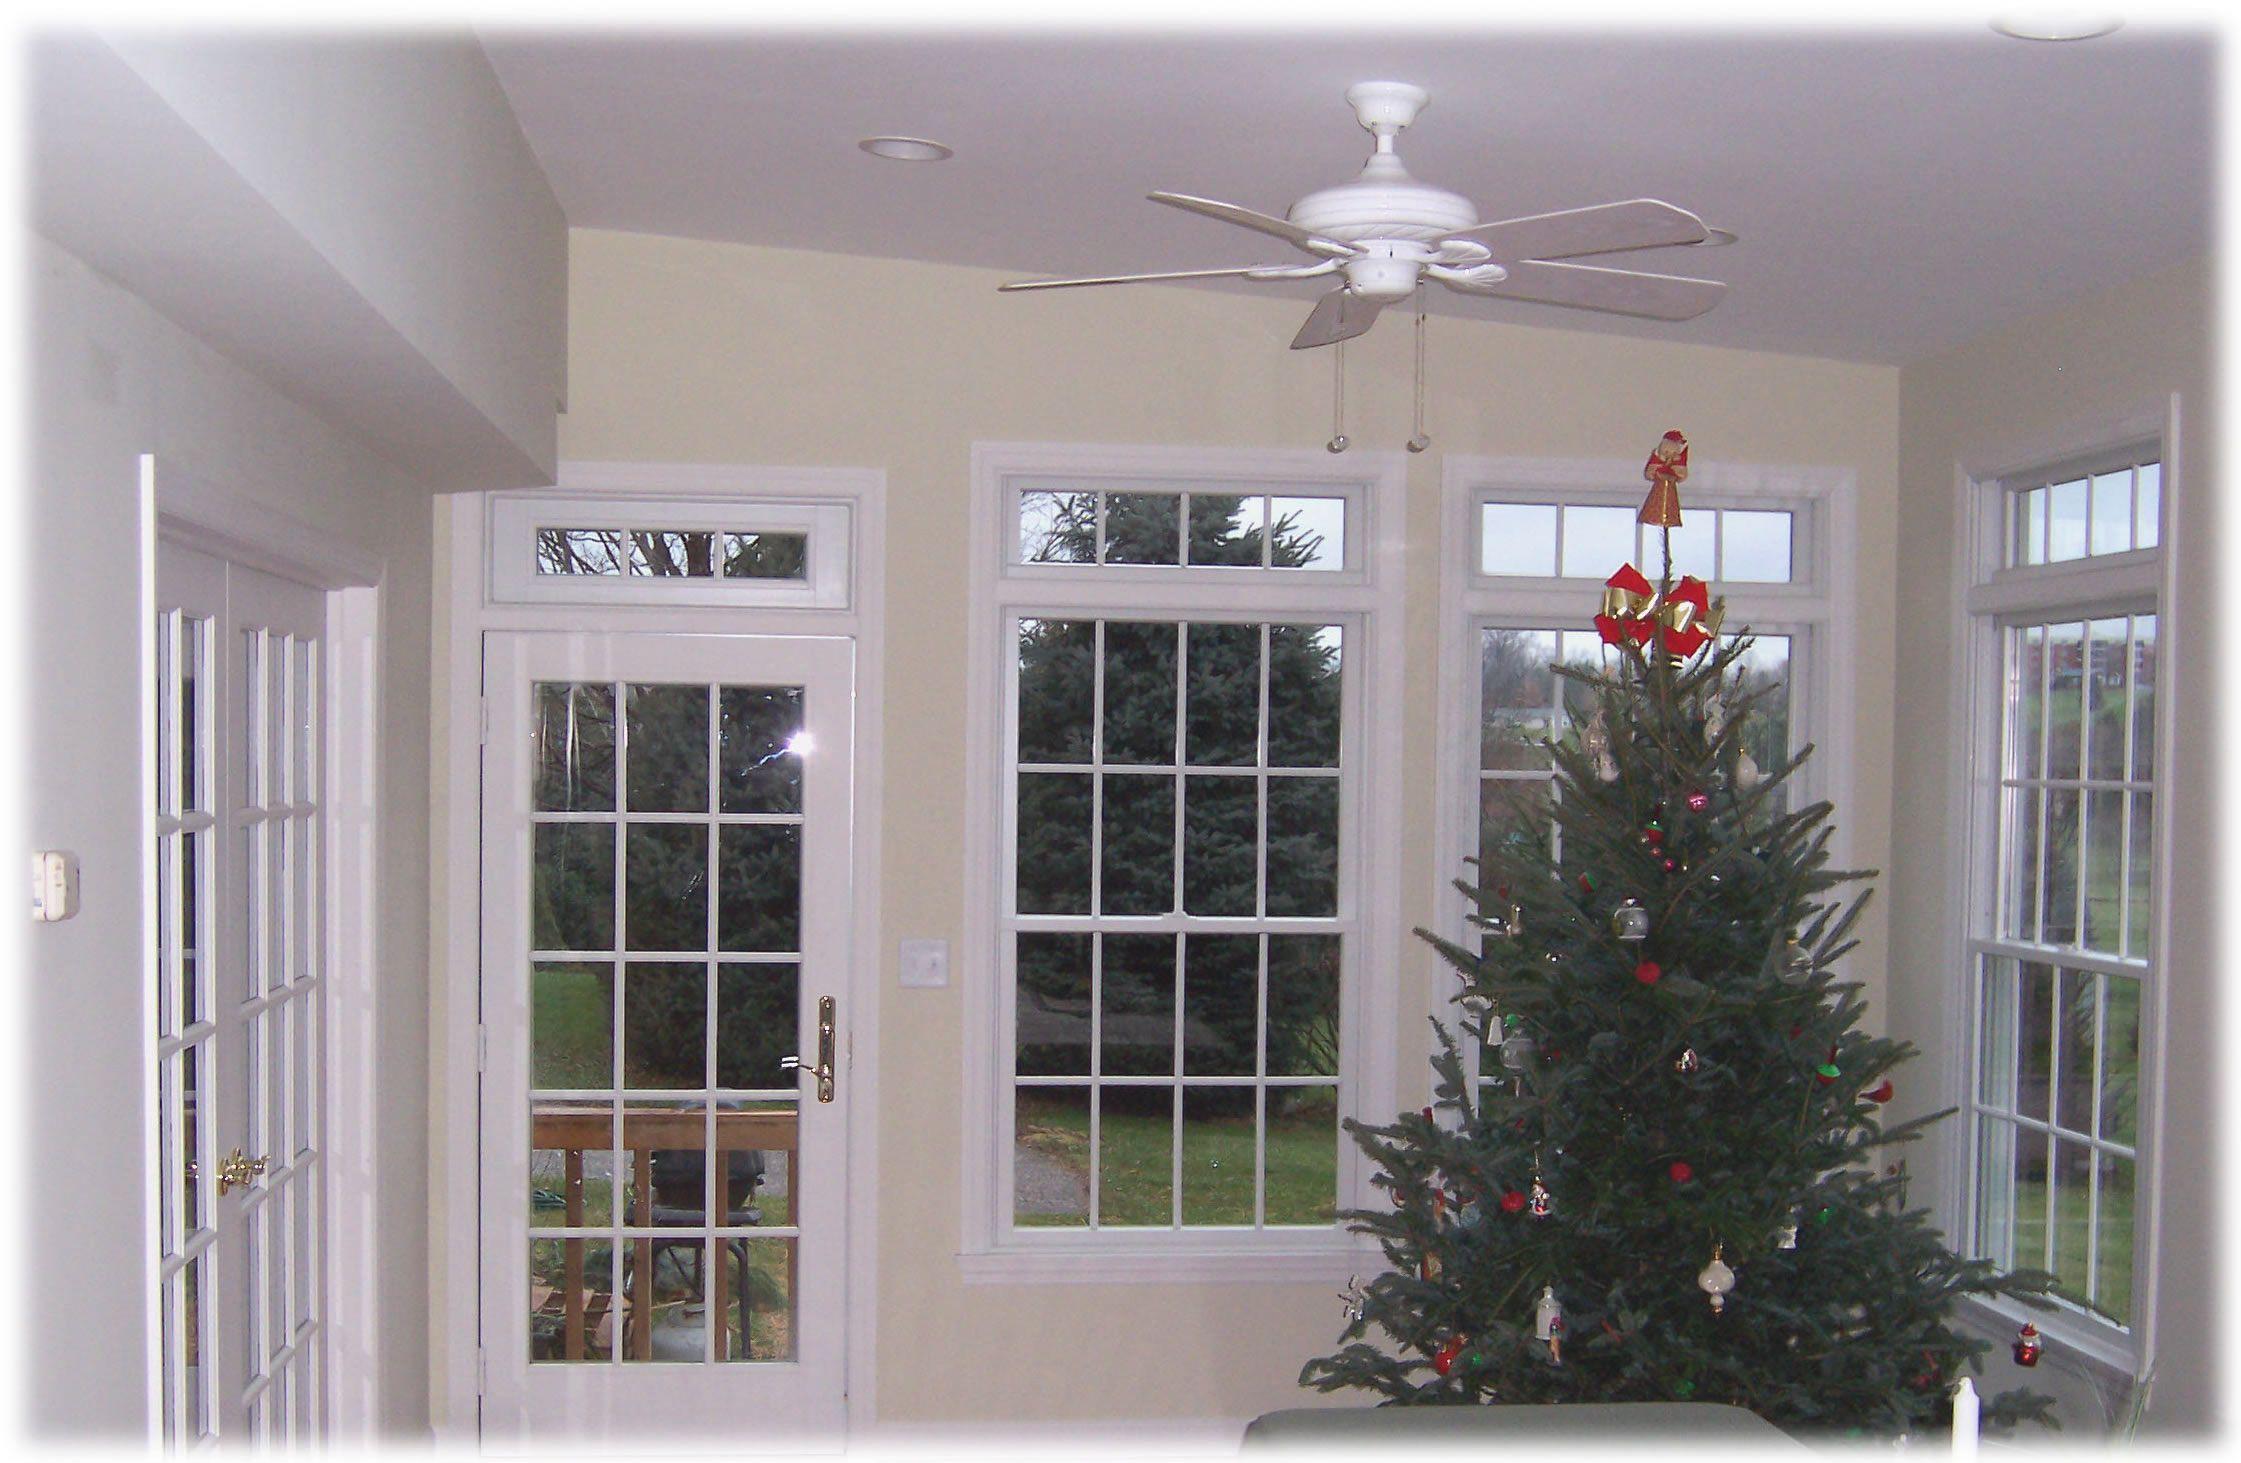 Nice Windows Window Design Latest Window Designs House Window Design